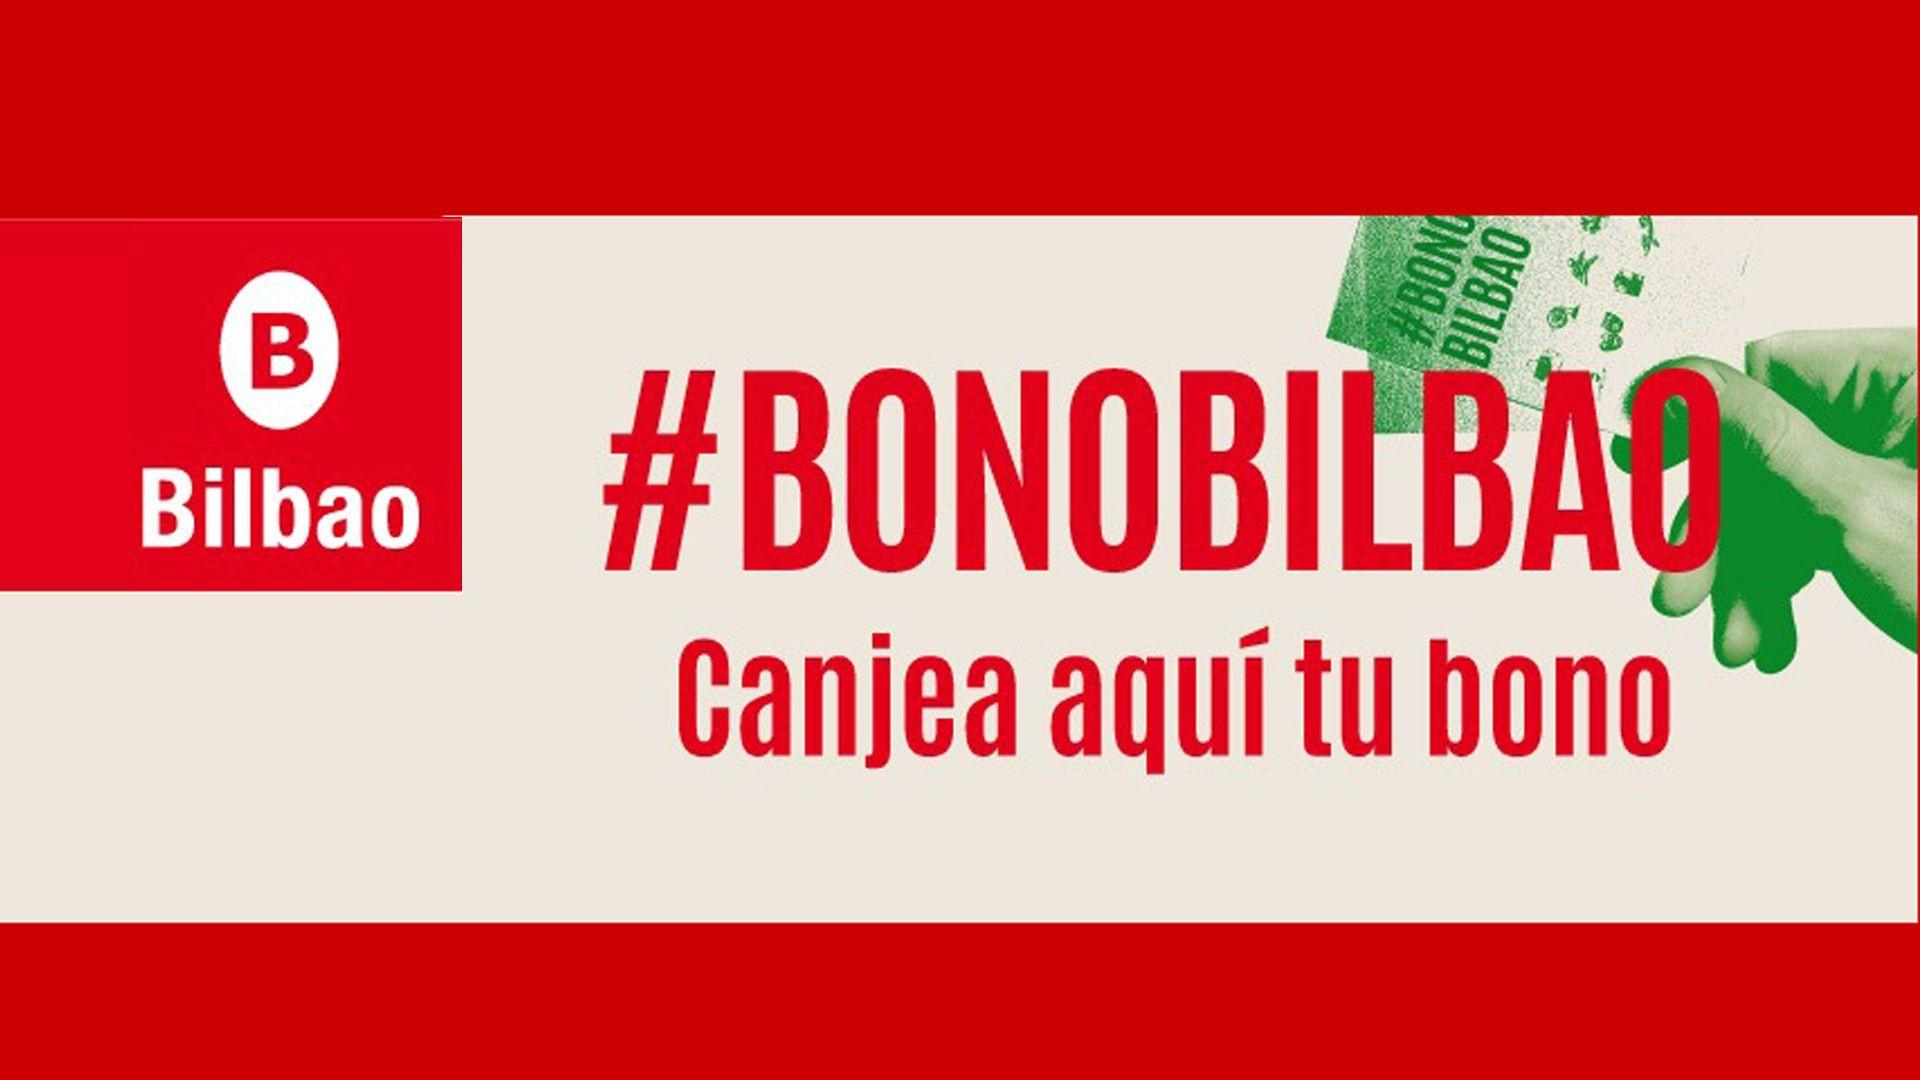 Bonobilbao